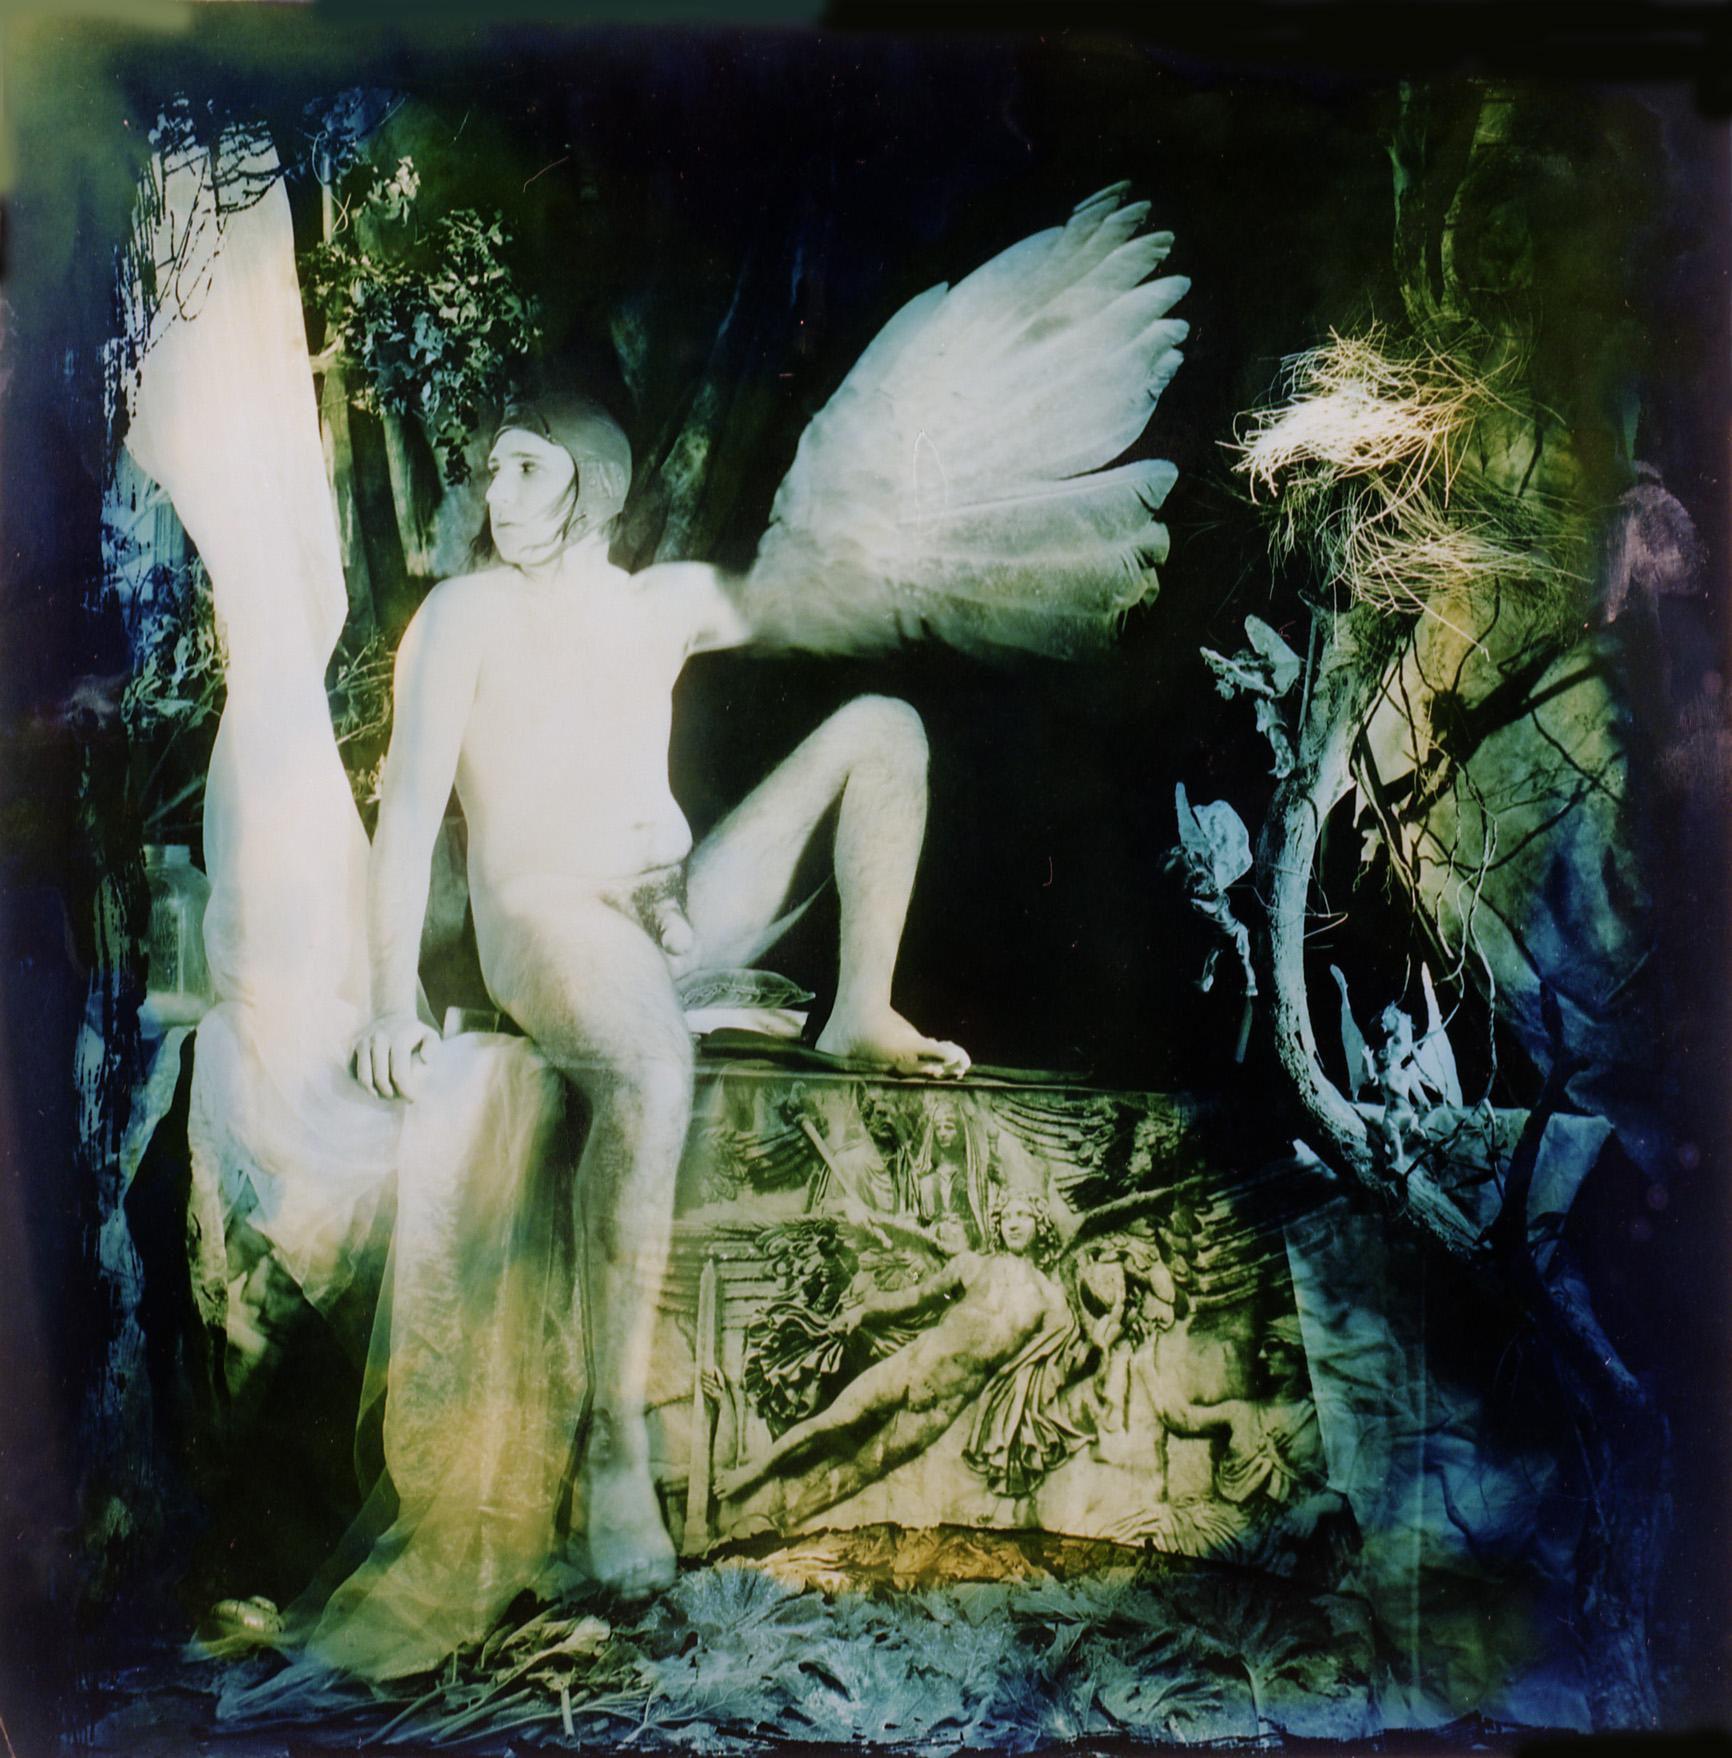 """Icarus,"" 1994, c-print, 16.25x16 in."